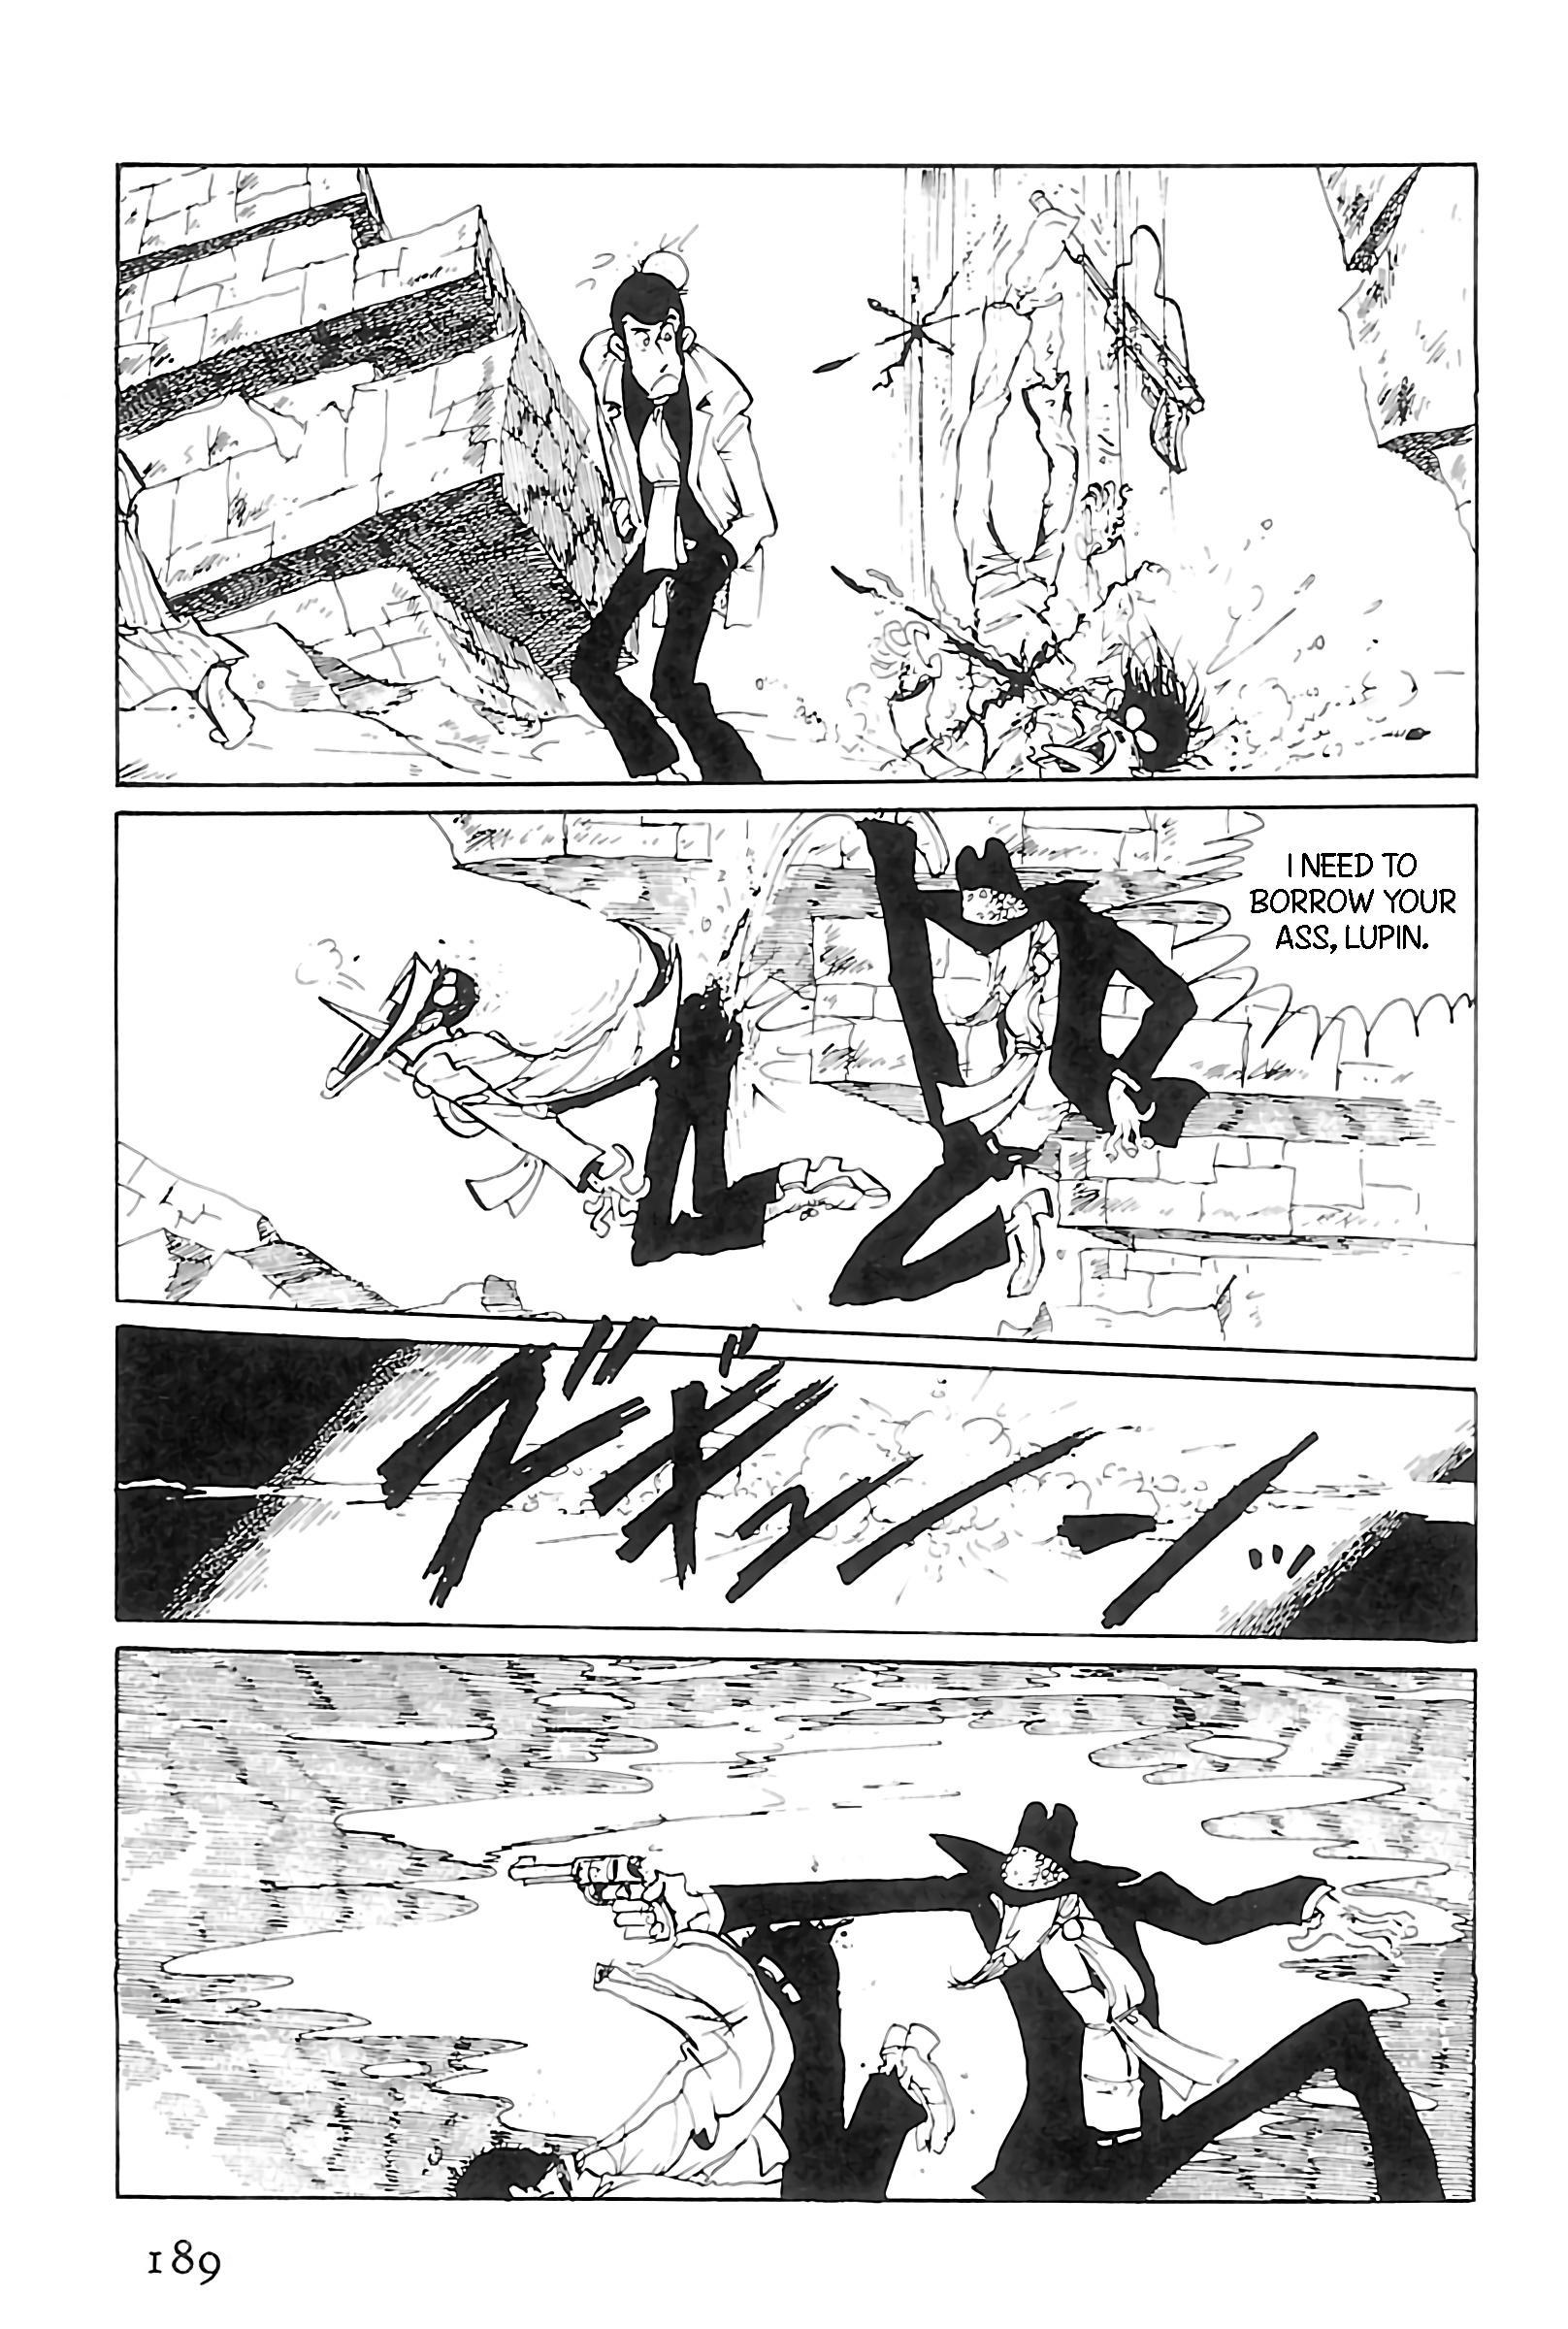 Lupin Iii: World'S Most Wanted Vol.11 Chapter 124: Happy New Year, Lupin! page 11 - Mangakakalots.com